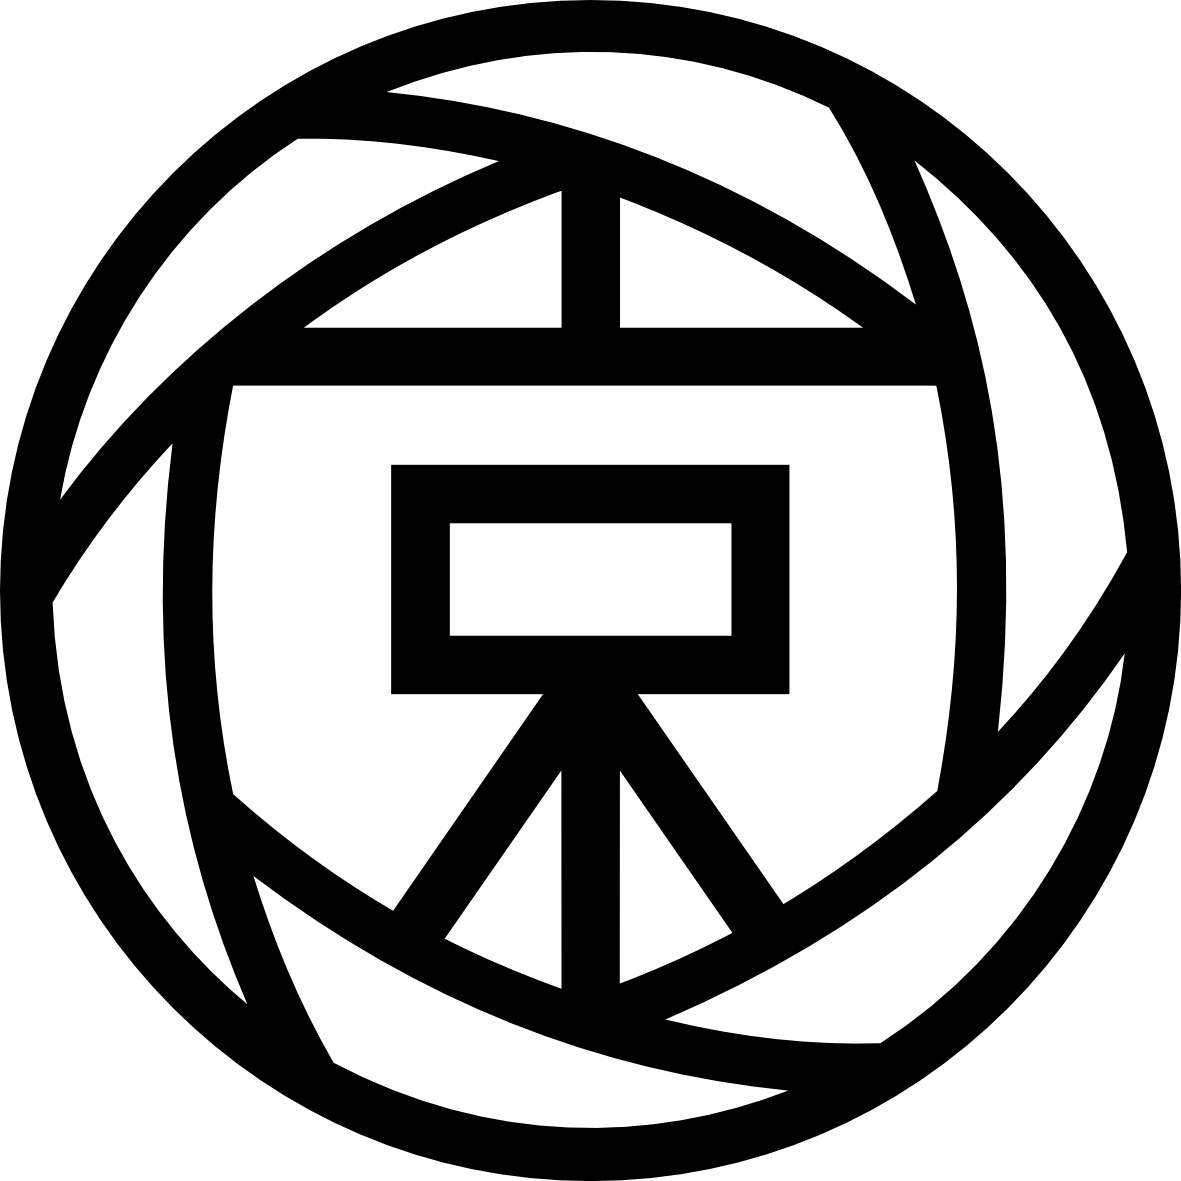 Kyotographer Logo - Moritz Marutschke